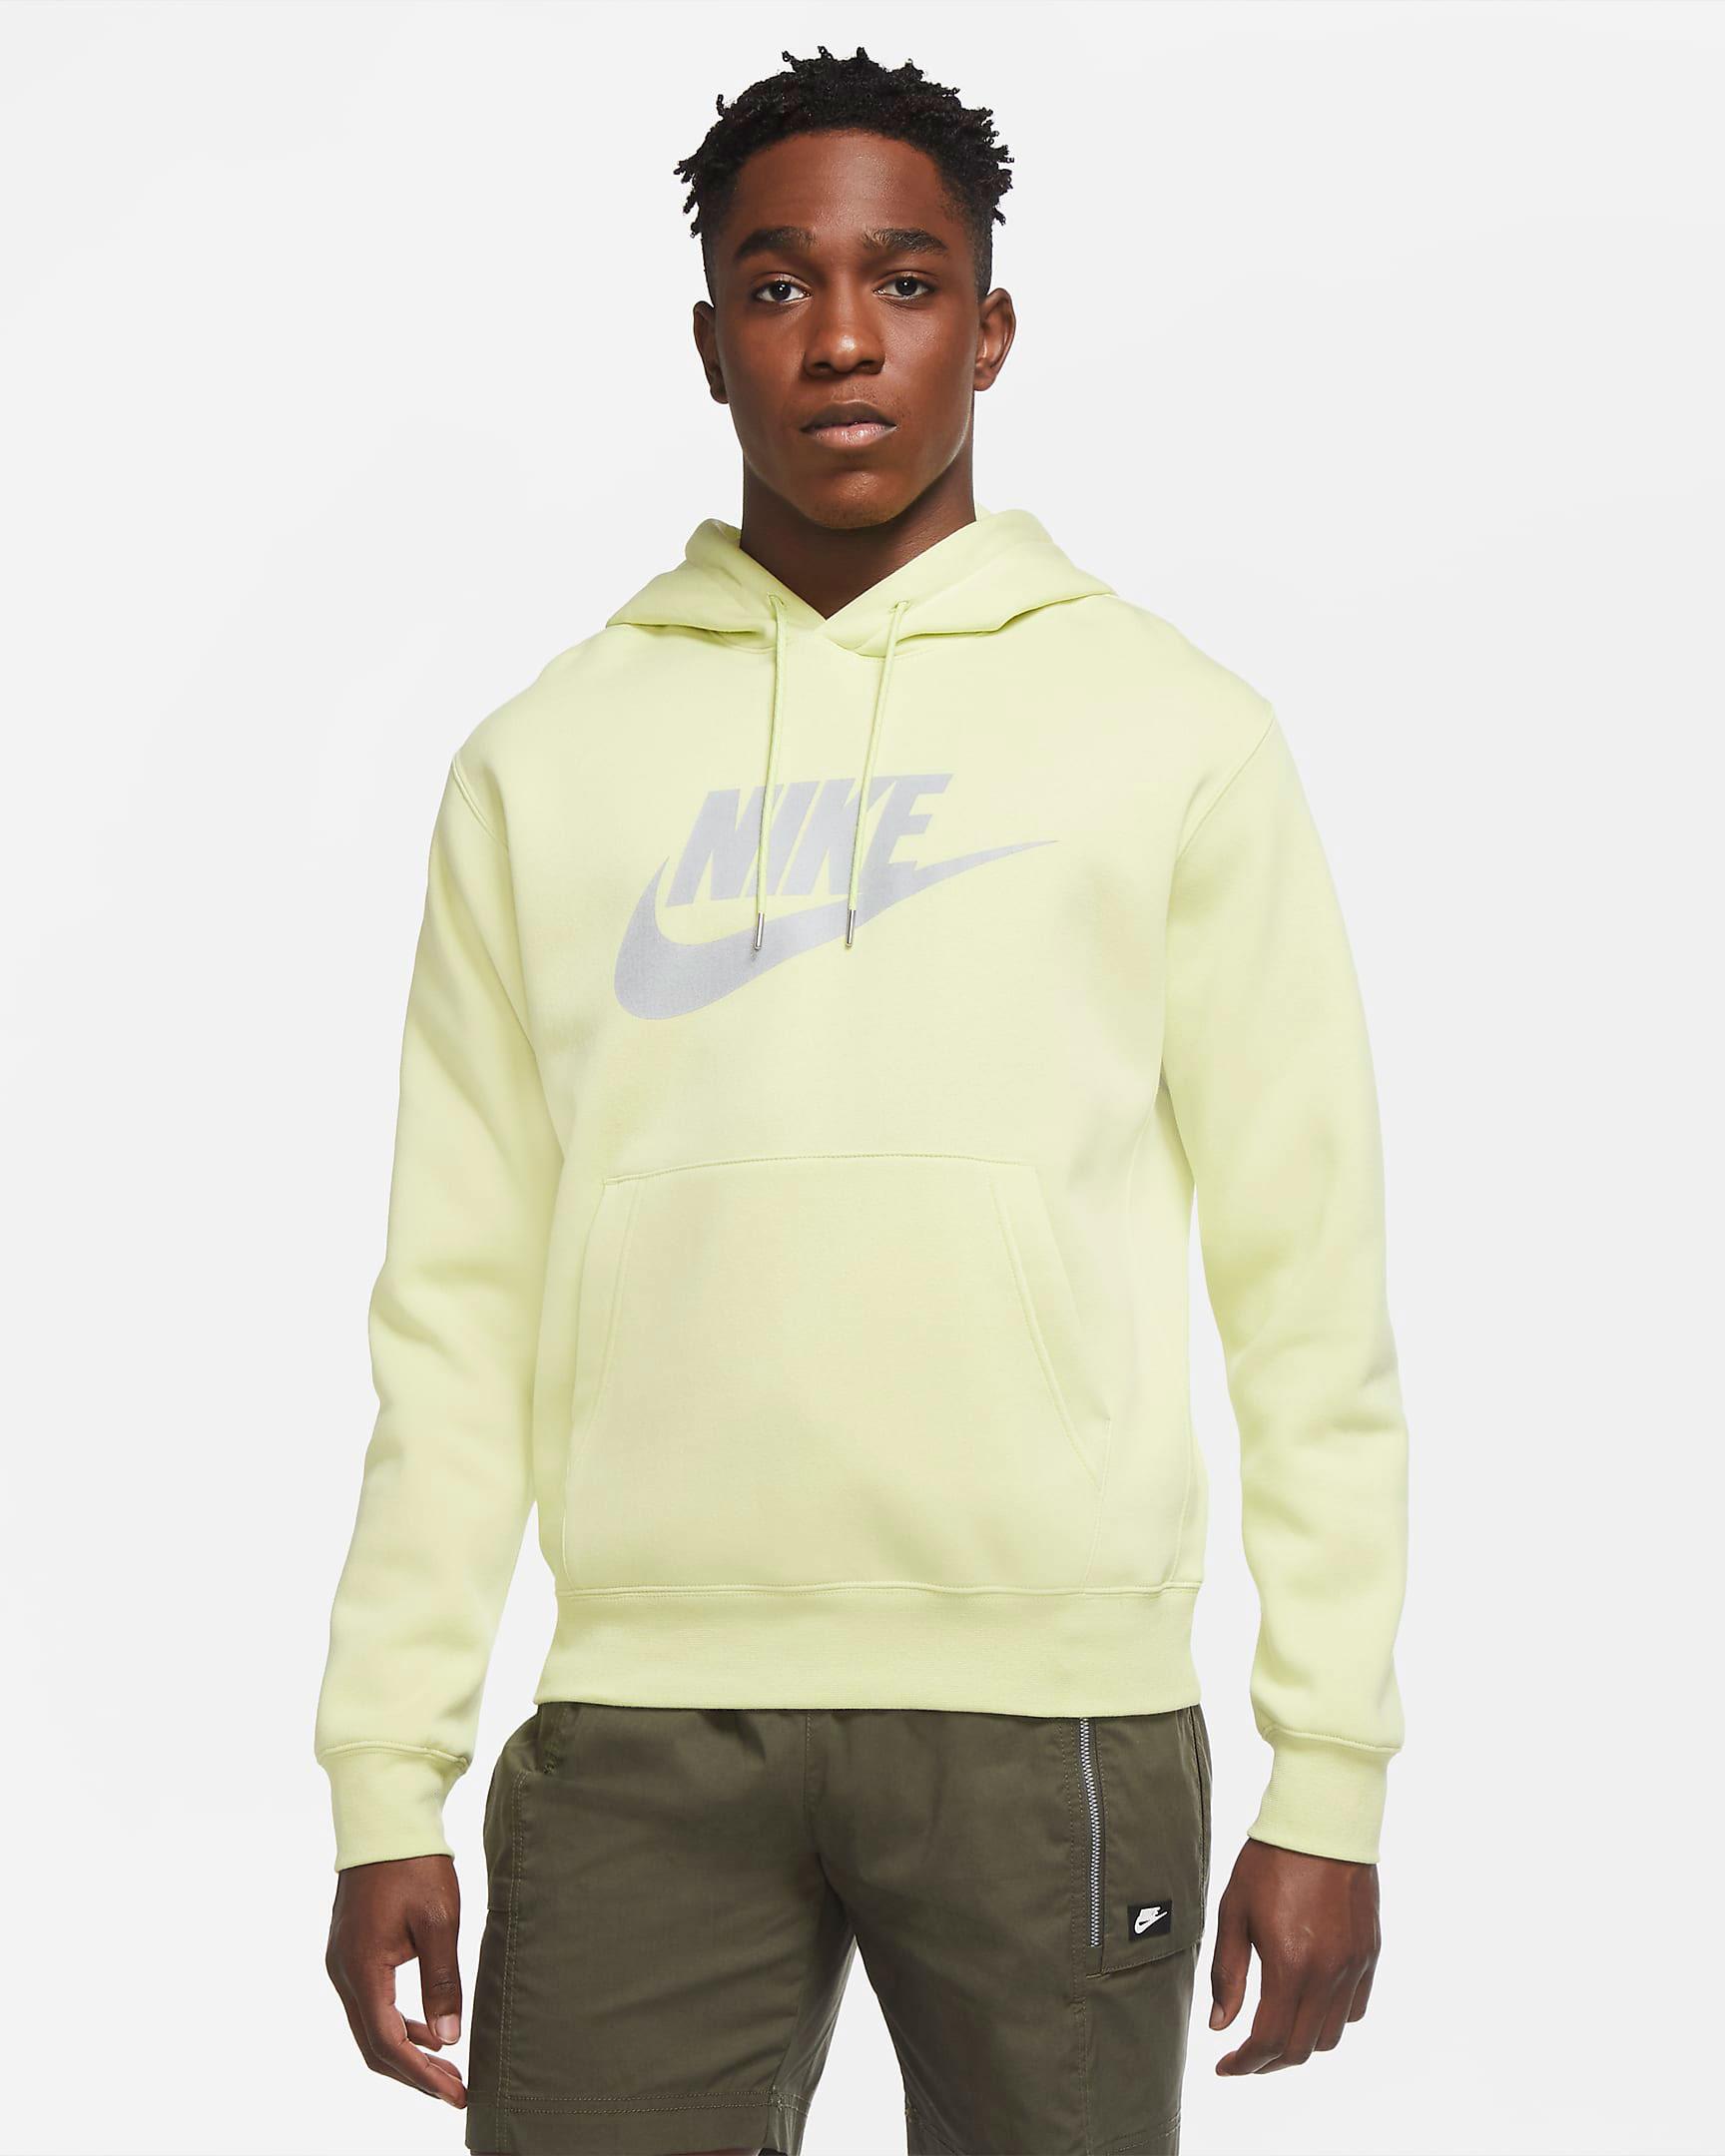 nike-air-force-1-orange-skeleton-hoodie-match-glow-green-1